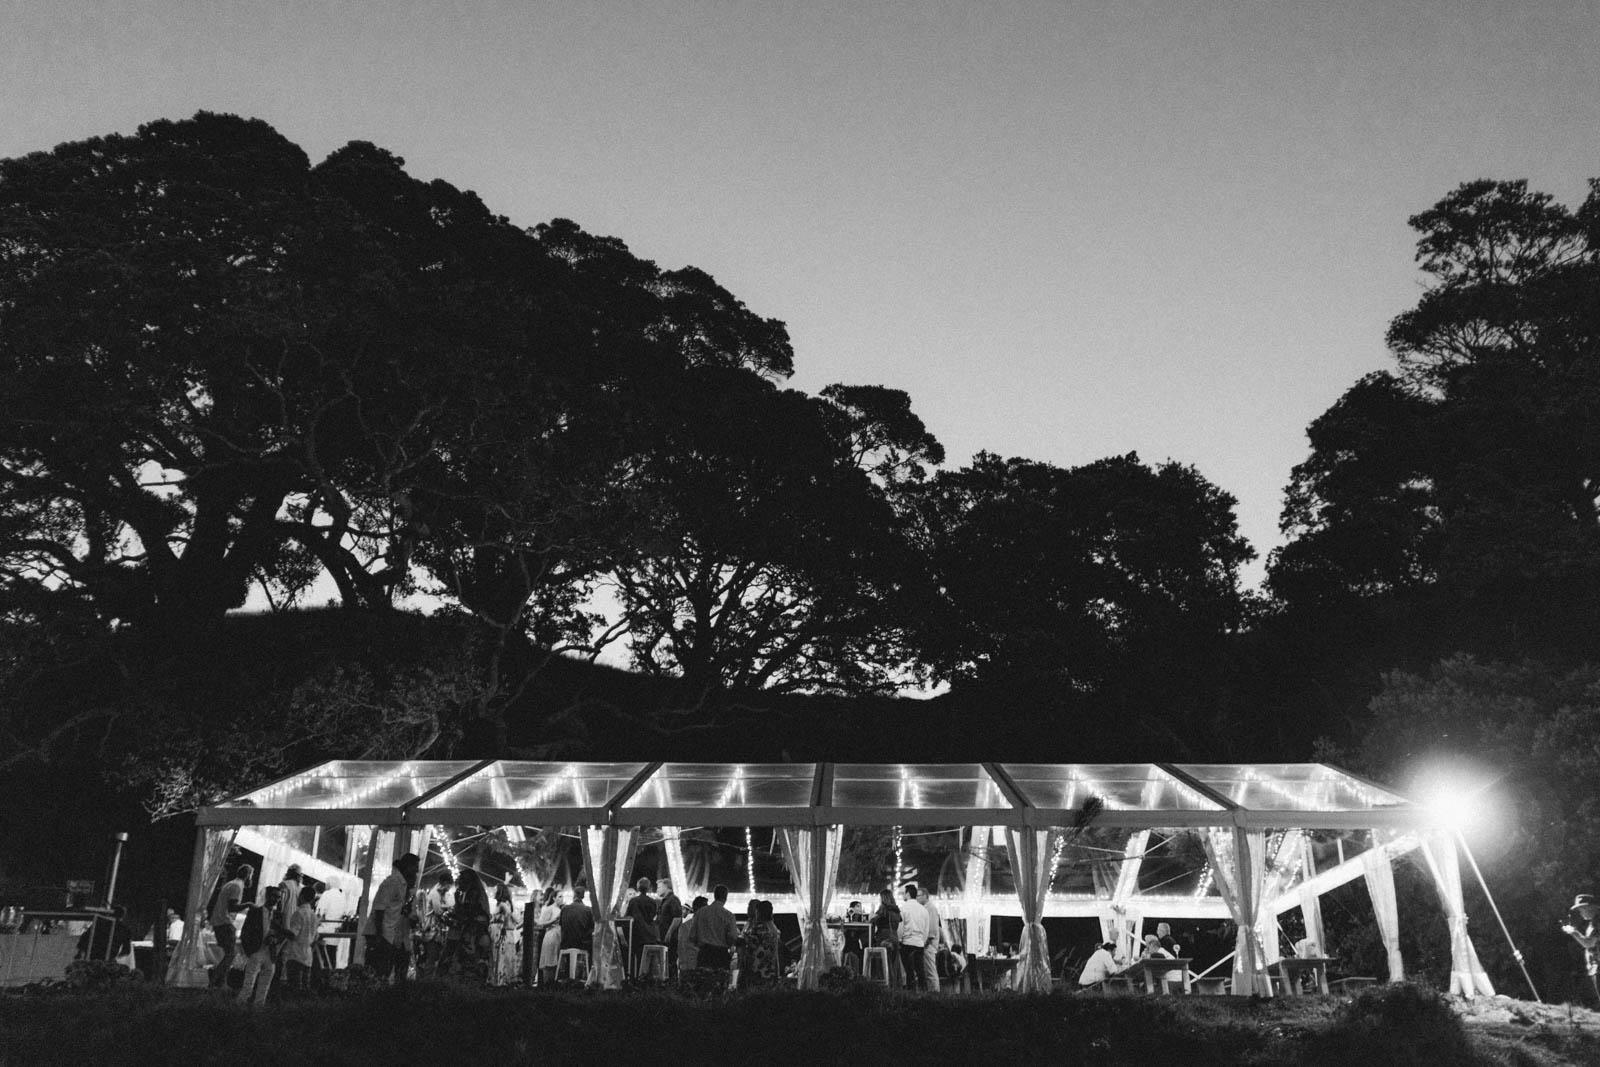 newfound-l-i-coromandel-wedding-photographer-2047-A9_05977